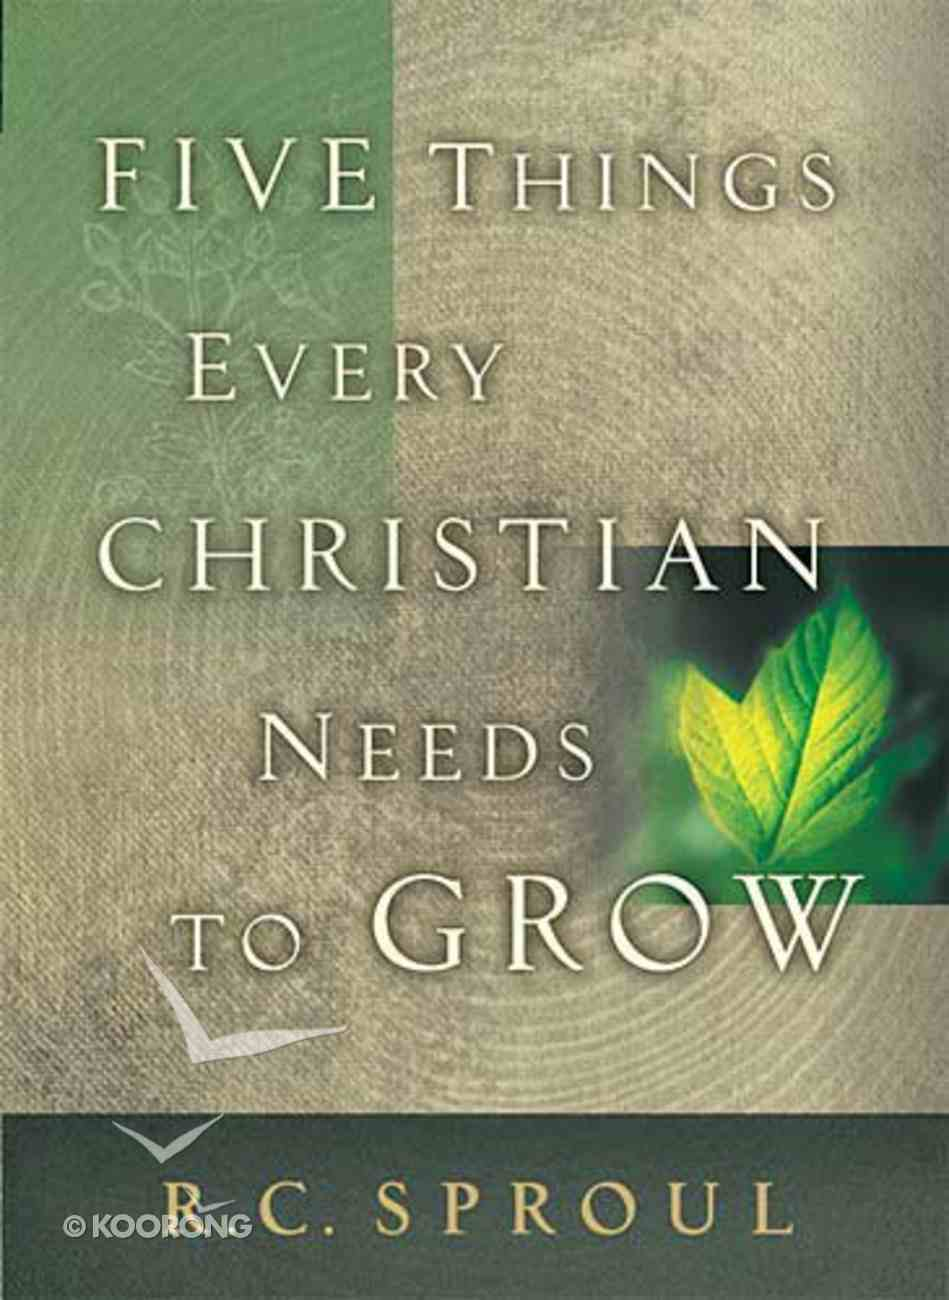 Five Things Every Christian Needs to Grow Hardback